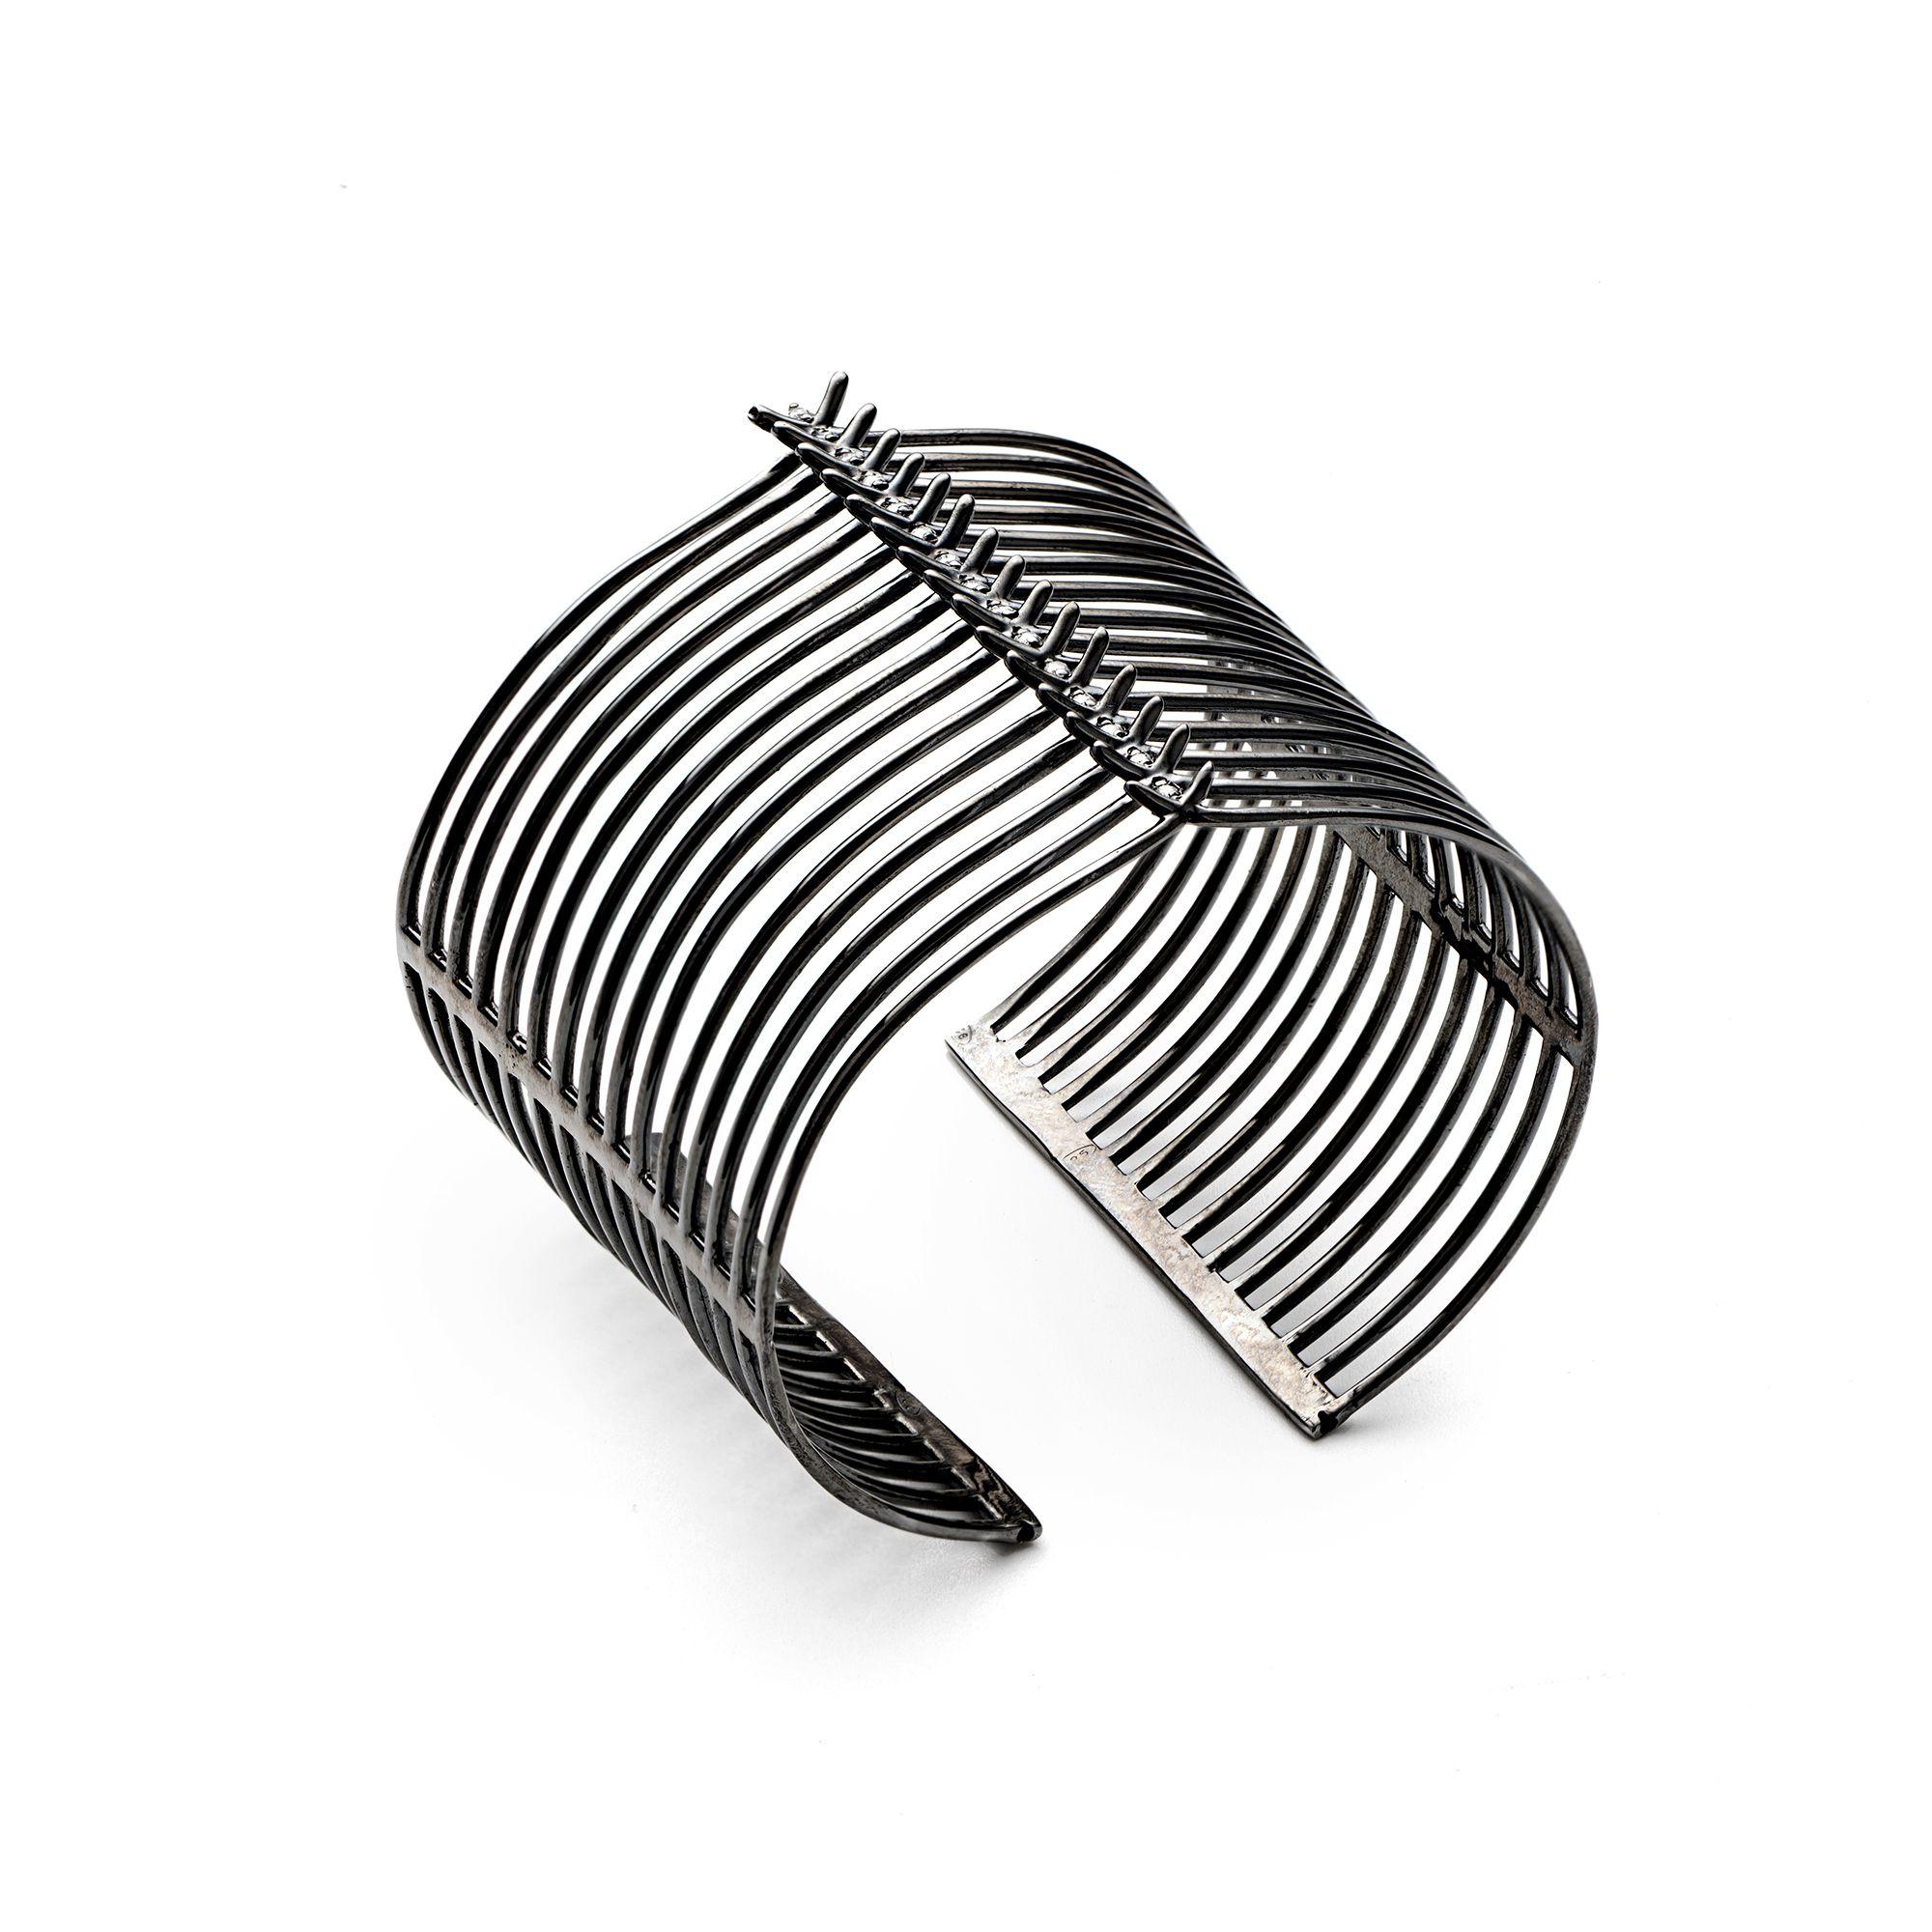 15 element 'Spinae' bracelet Black silver cuff bracelet with stones